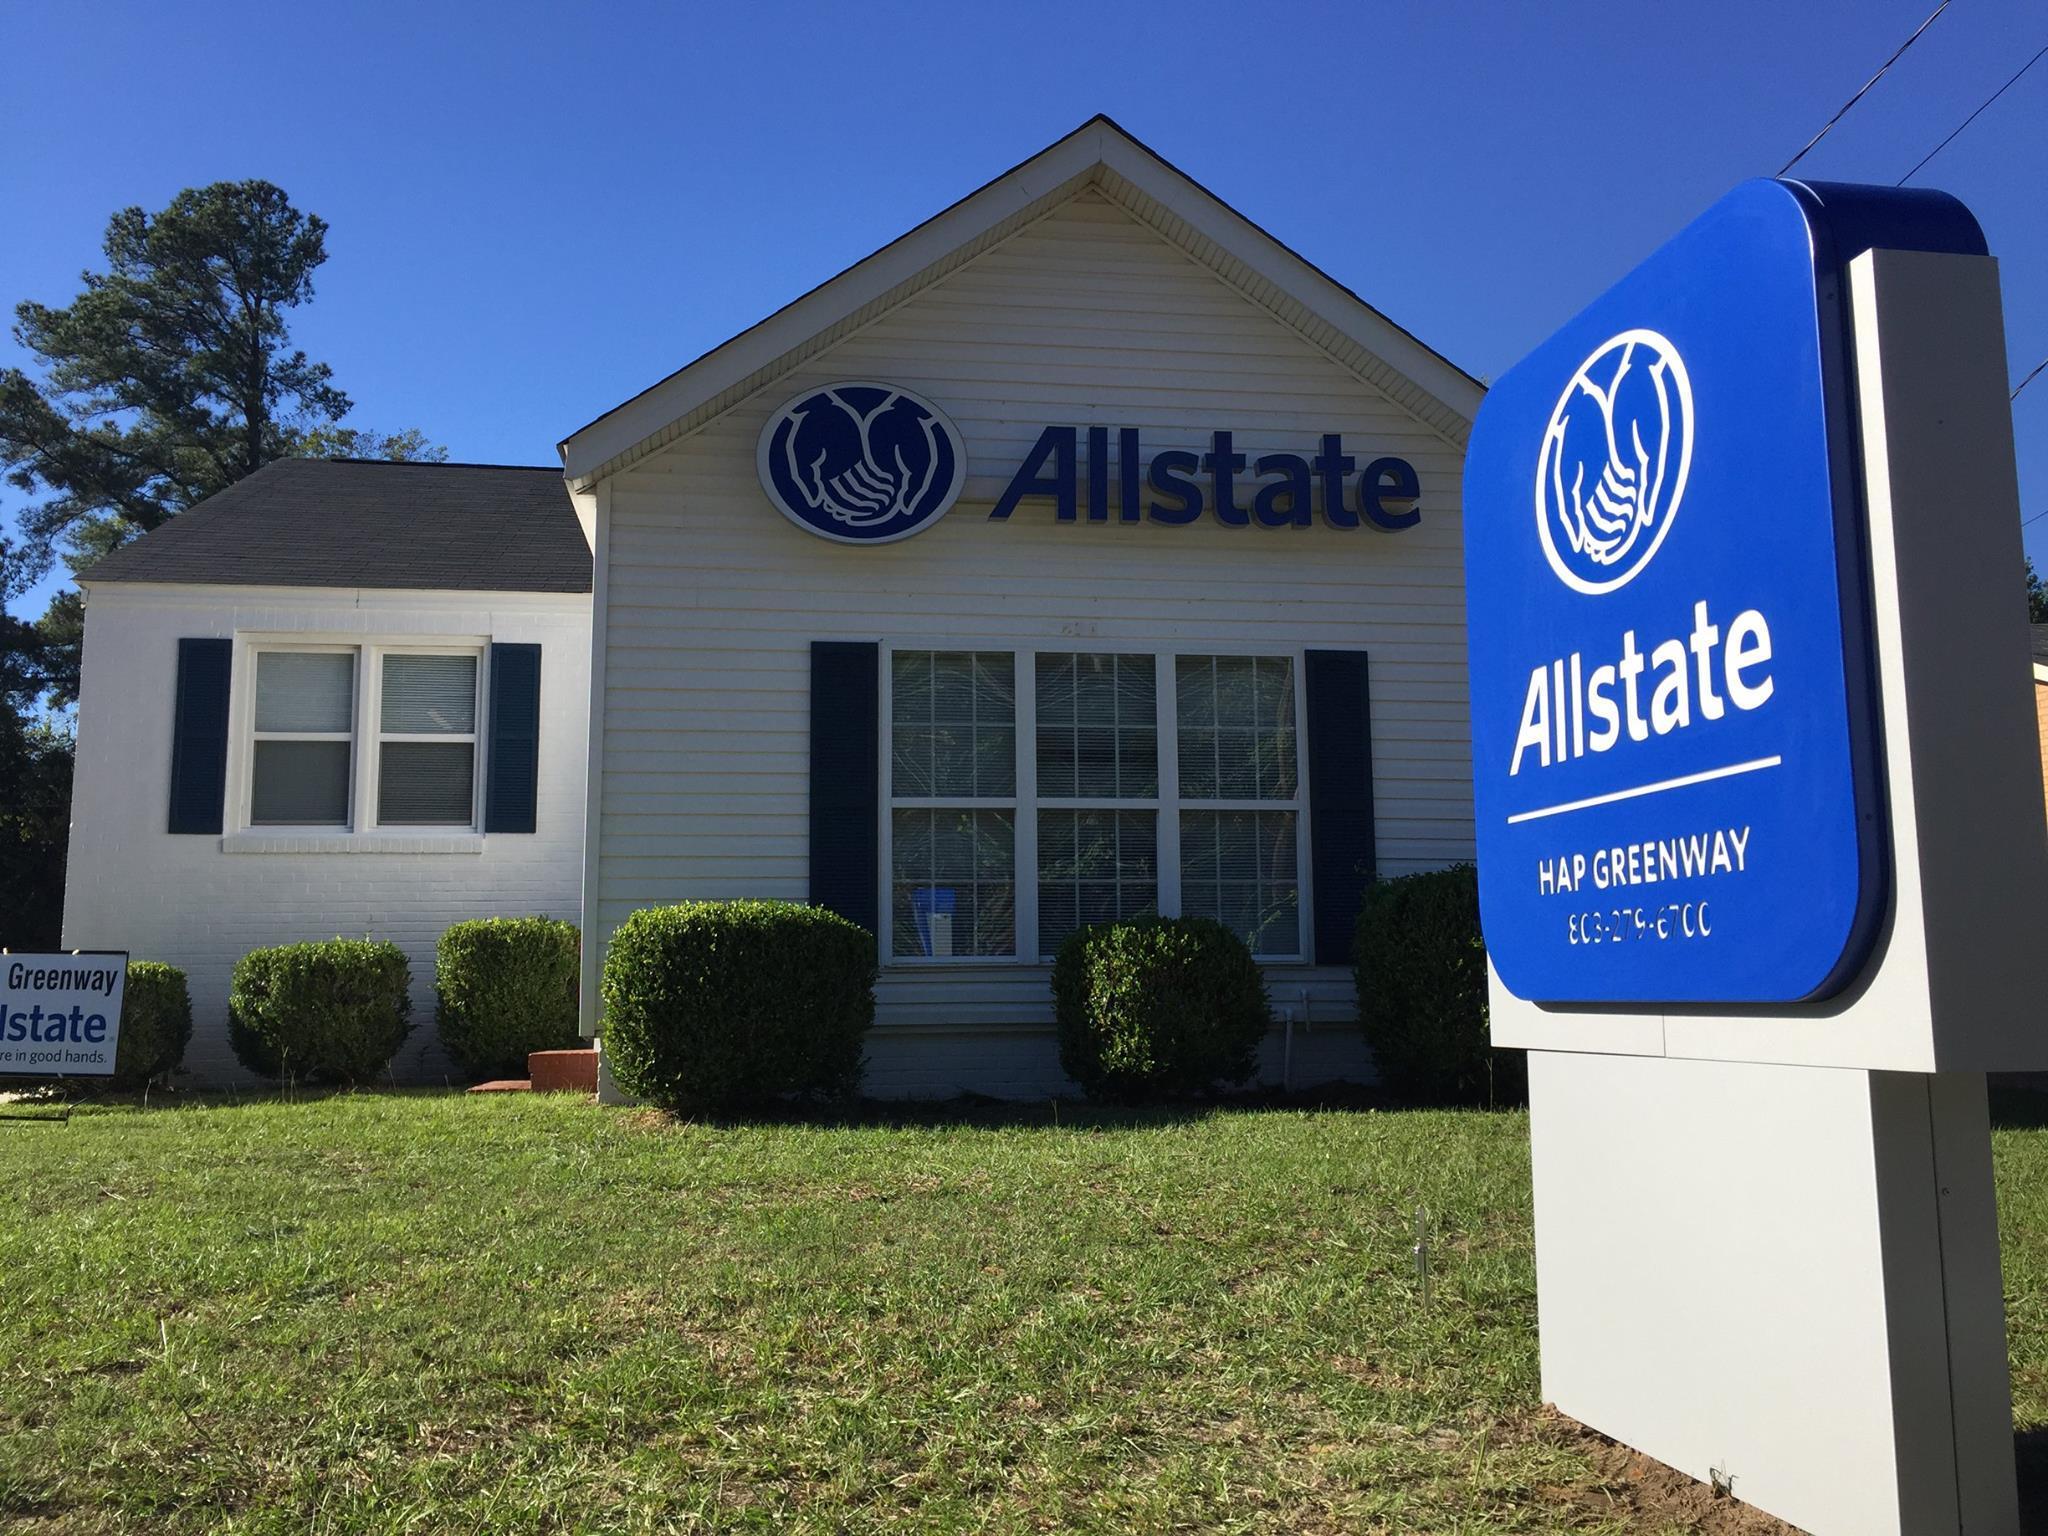 Hap Greenway: Allstate Insurance image 5